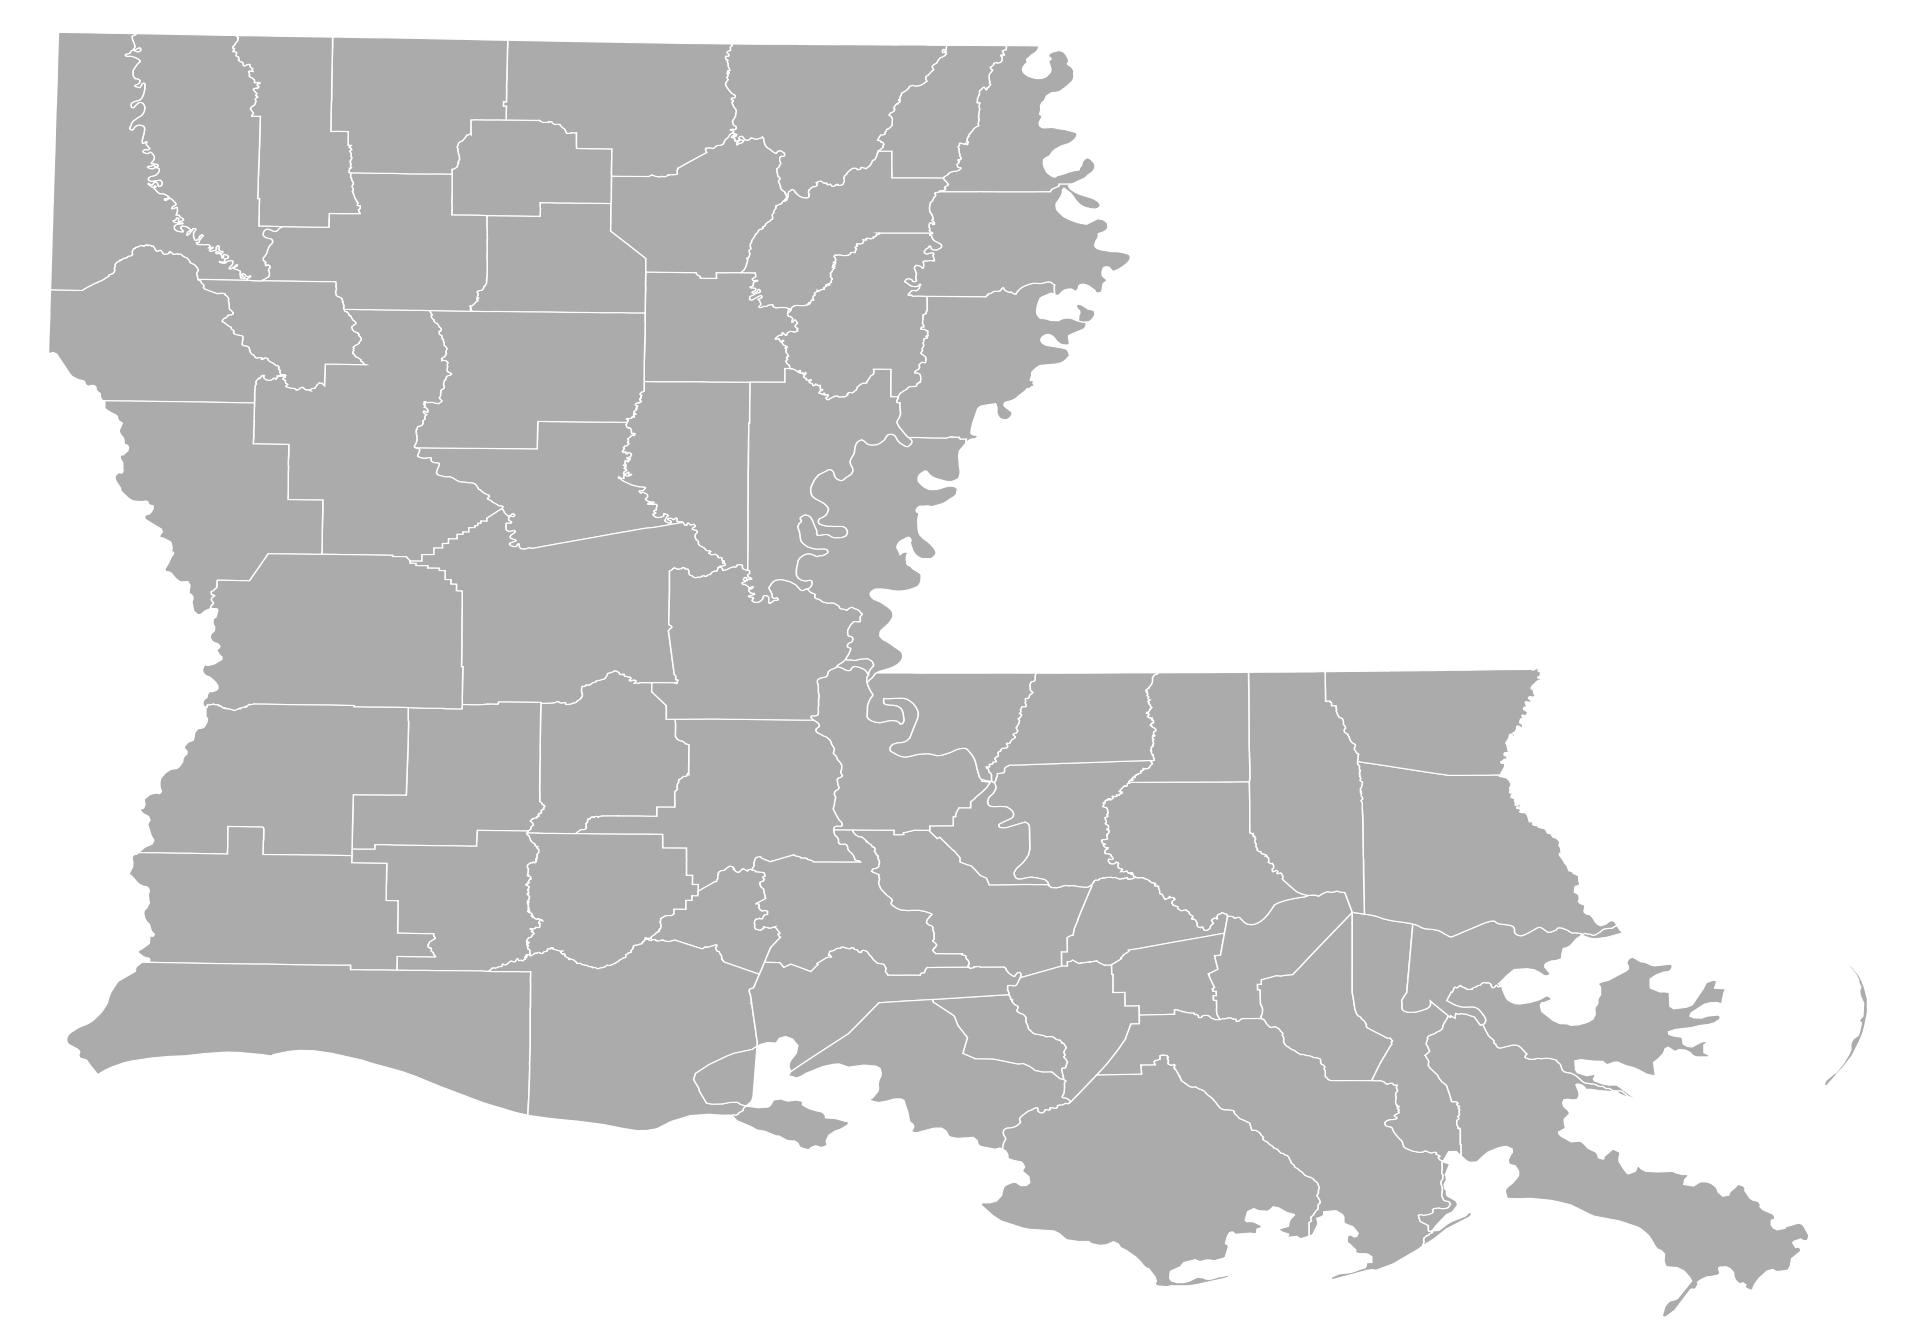 Louisiana Counties • Mapsof.net.